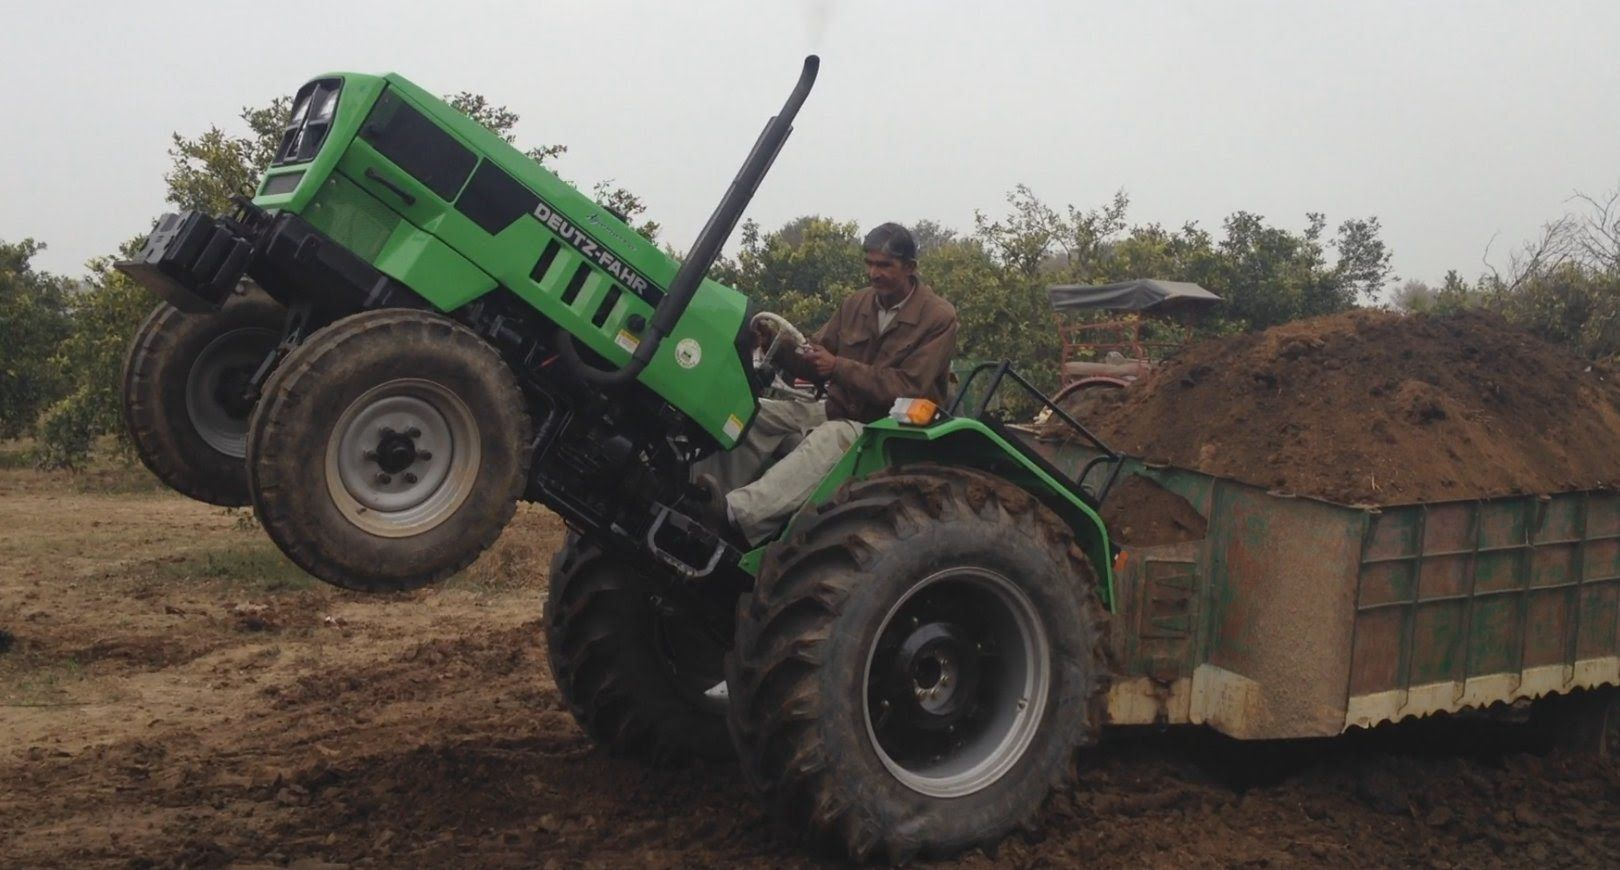 Grond En Mesttransport Met Mahindra En Deutz In India Trekkerweb Traktor